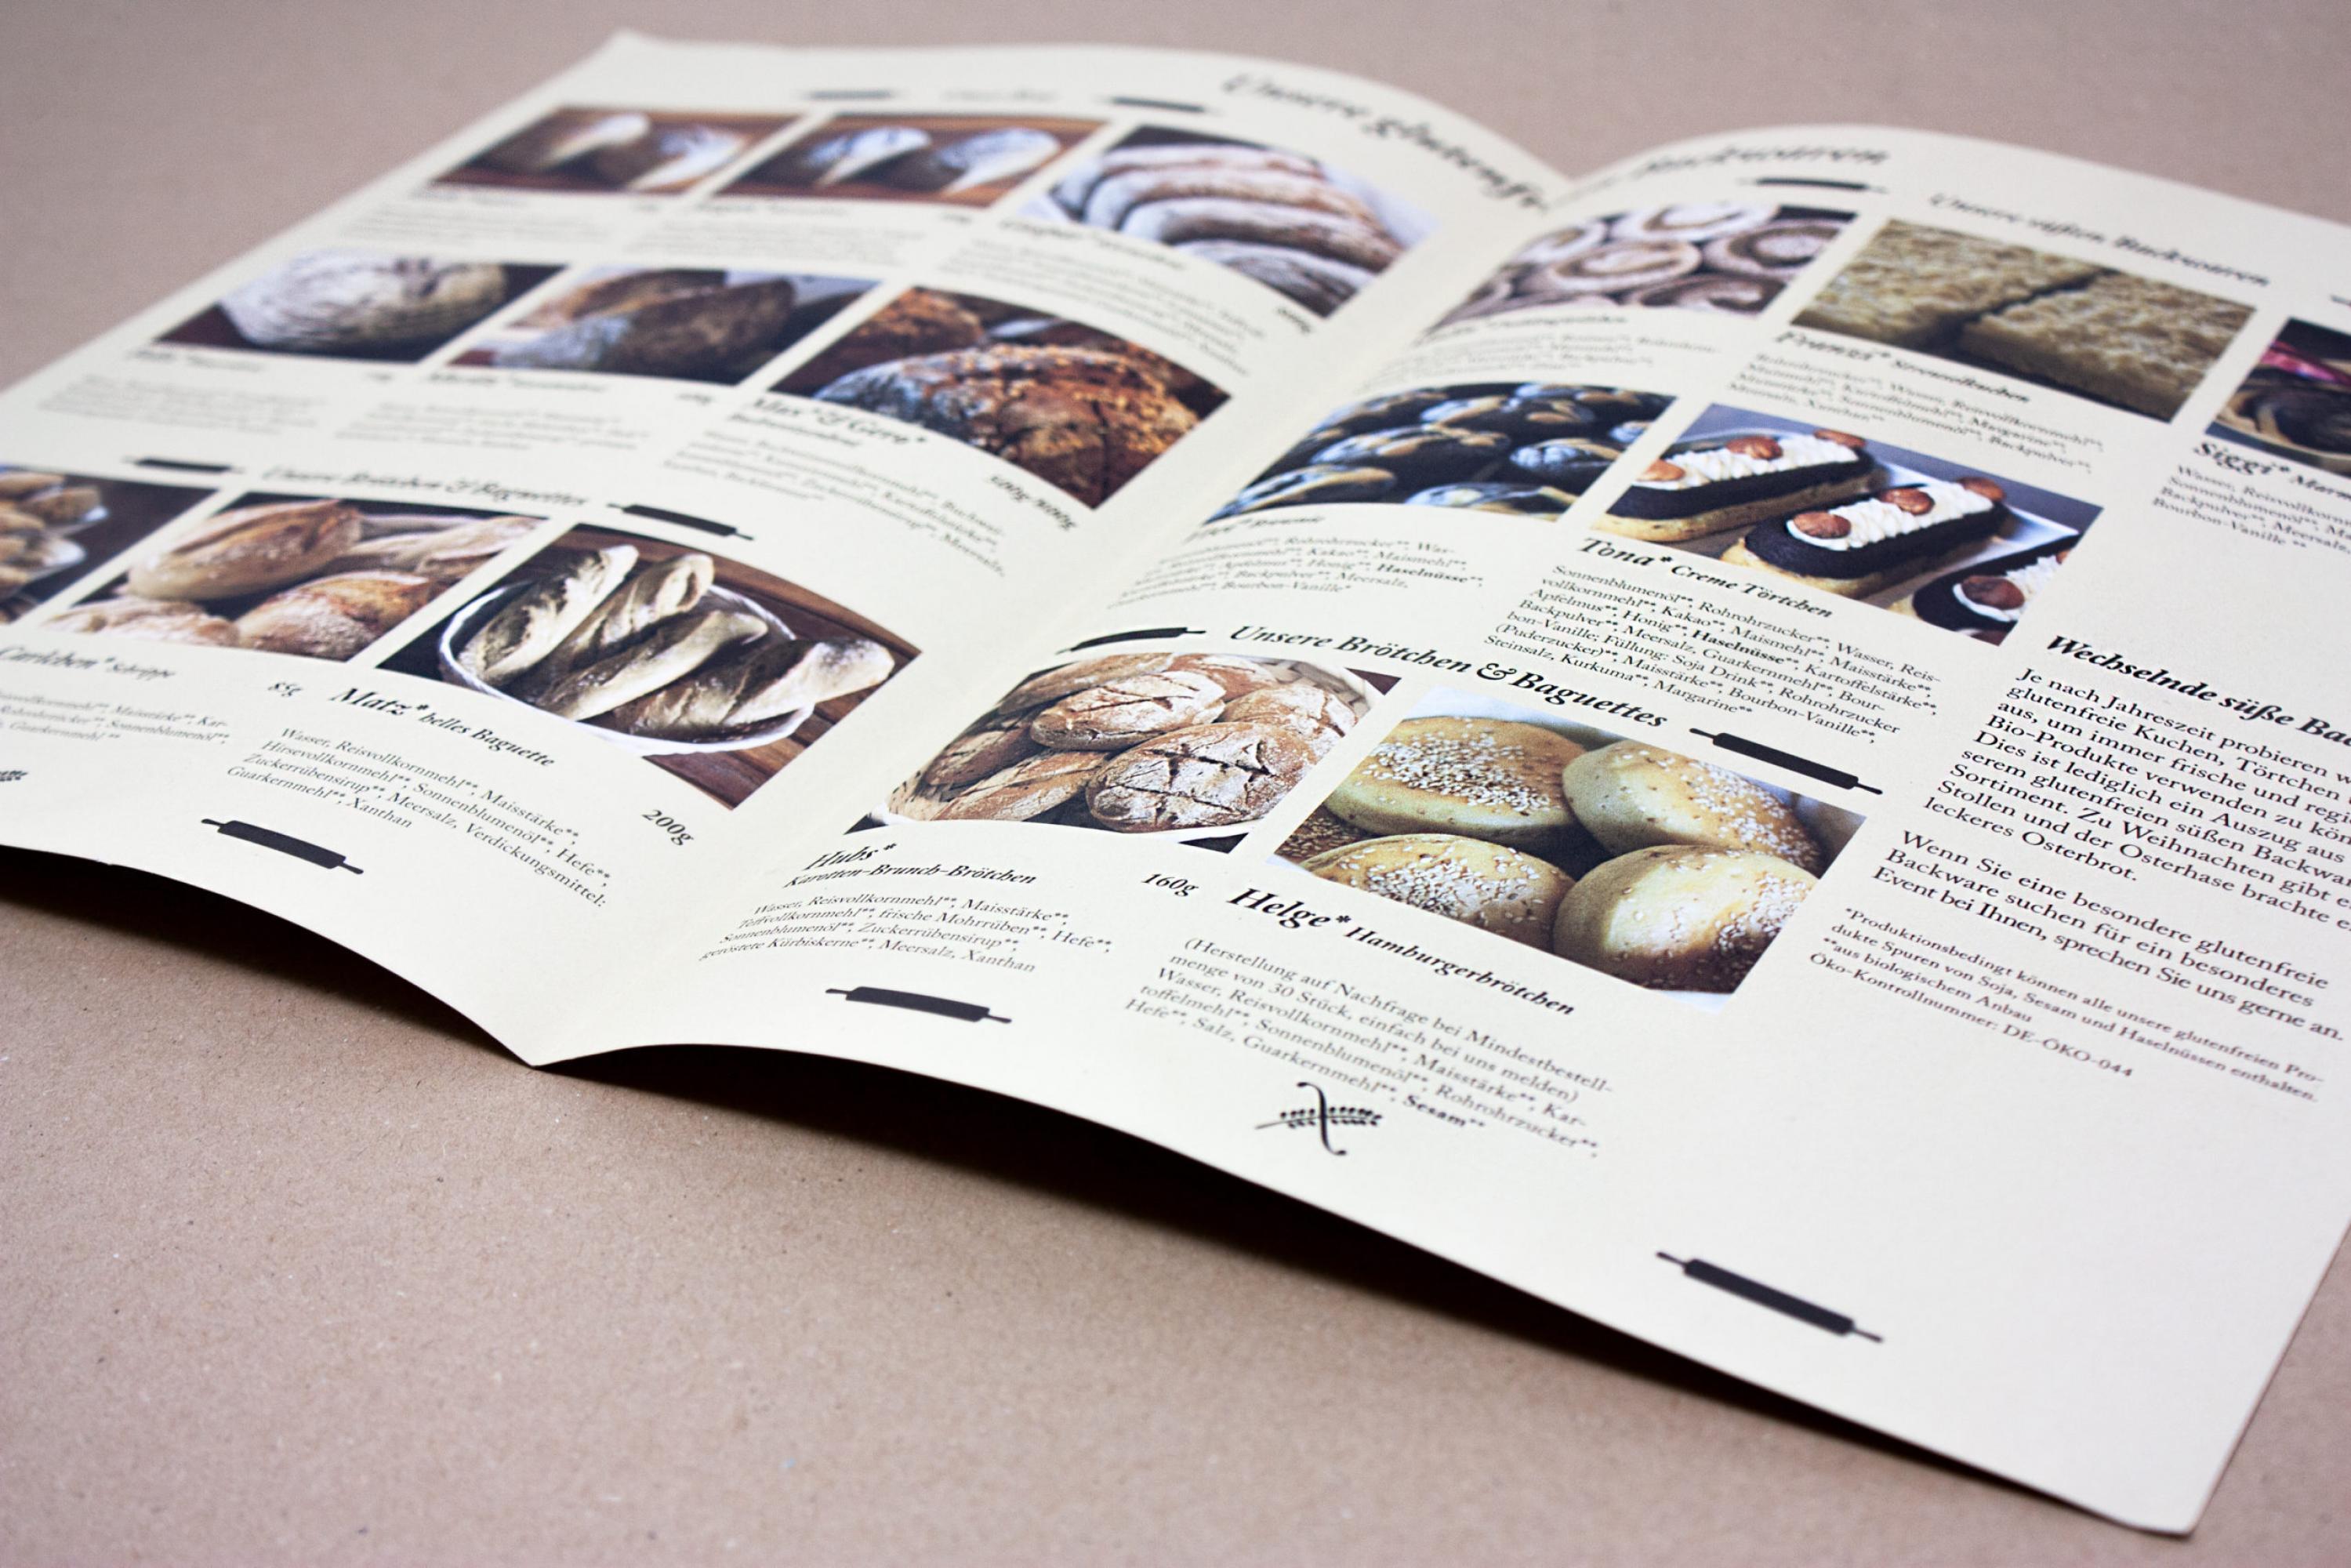 Print-broschuere-jute-baeckerei-formlos-corporate-design-4